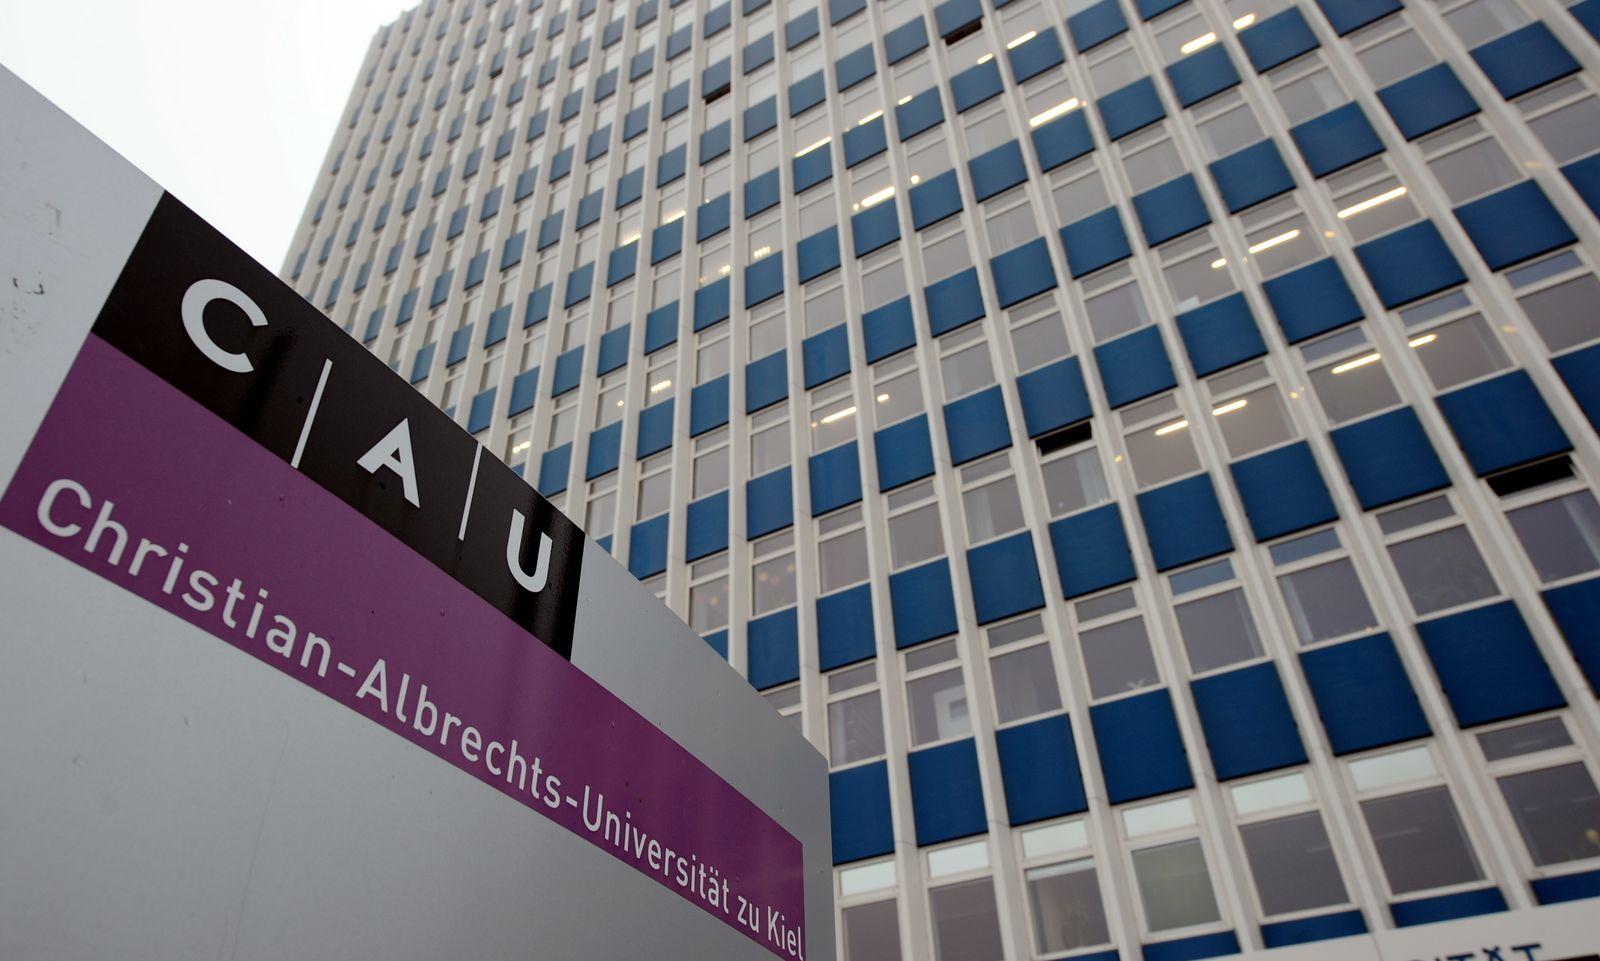 Christian-Albrechts-Universität / Kiel